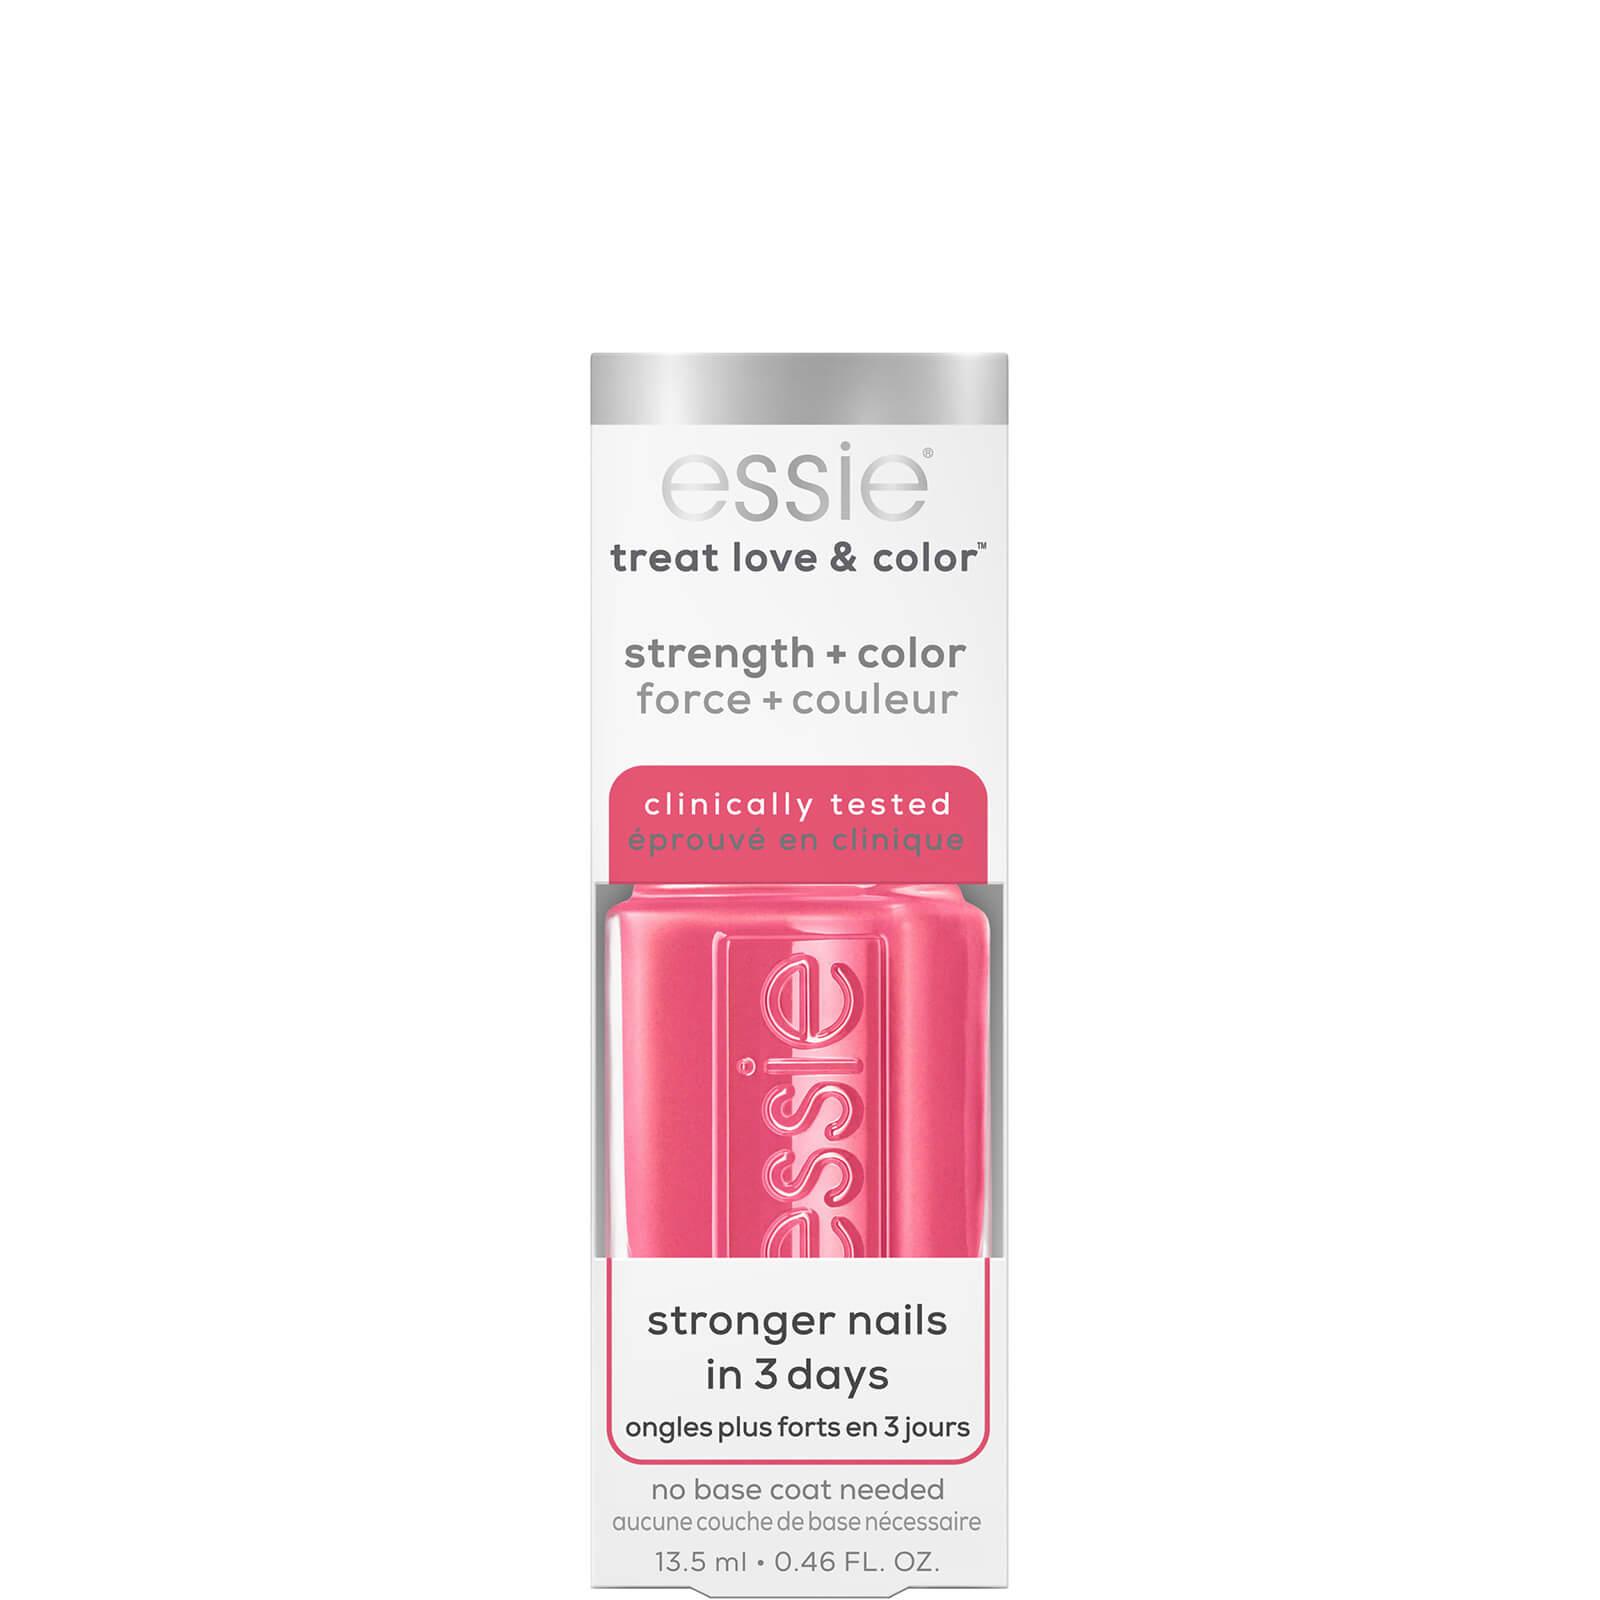 Купить Essie Treat Love Colour TLC Care Nail Polish 13.5ml (Various Shades) - 162 Punch it up